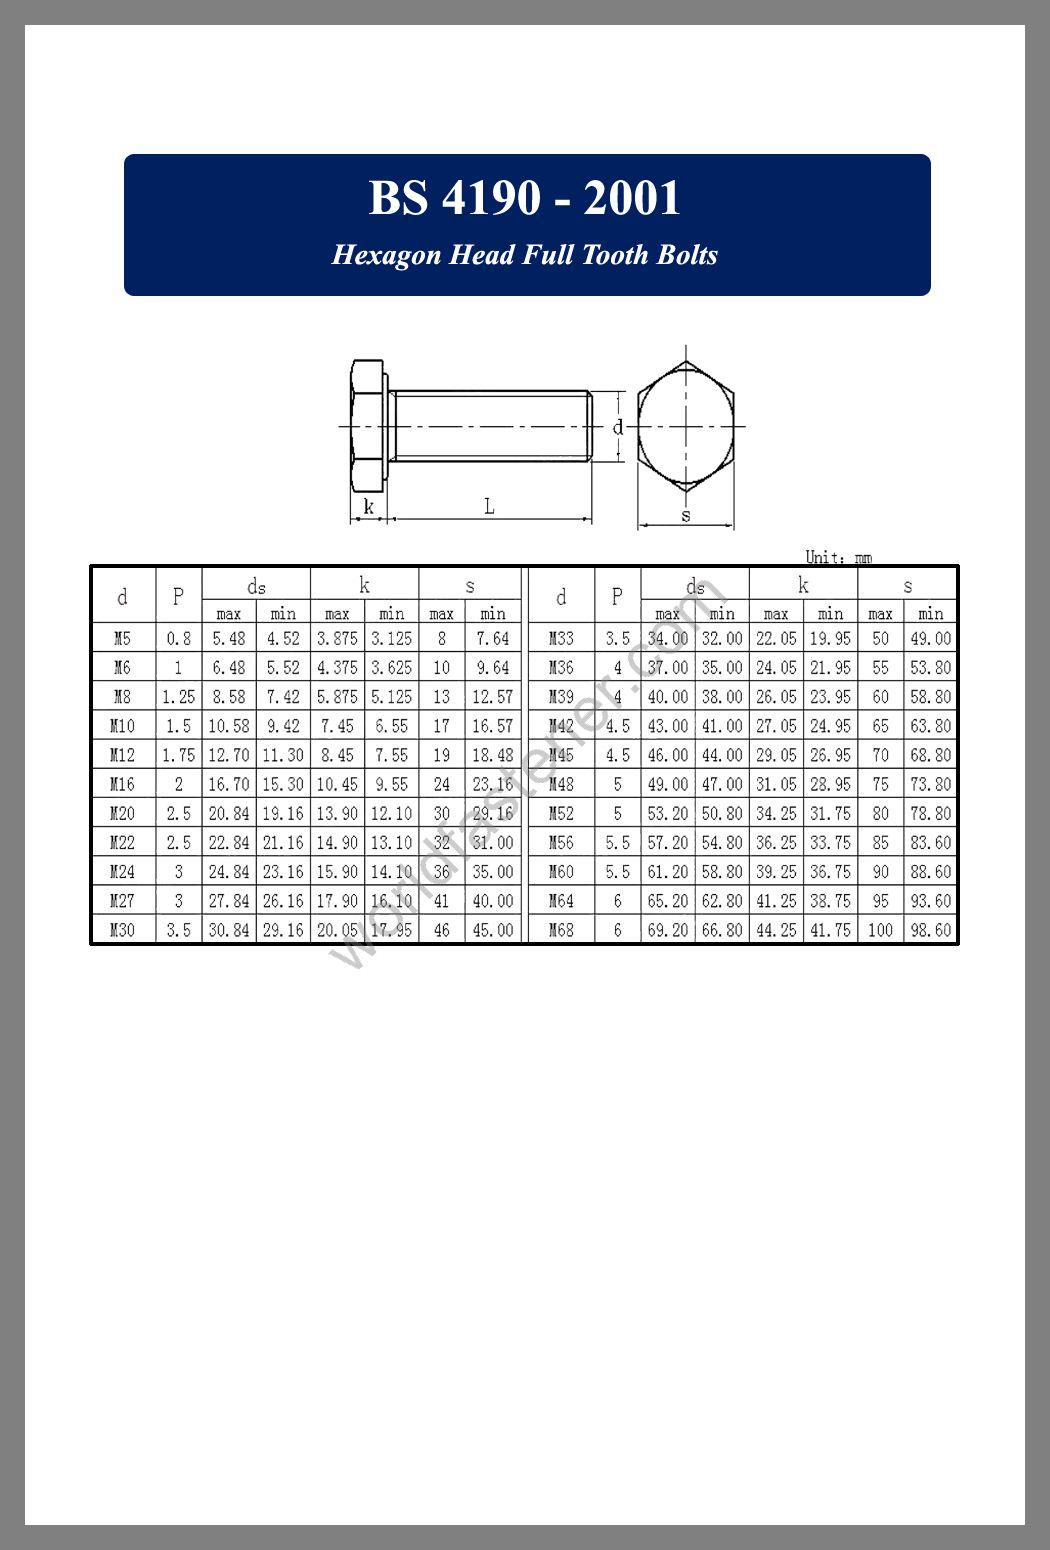 BS 4190, BS 4190 Hexagon Head Full Tooth Bolts, fastener, screw, bolt, BS Bolt, BS fastener